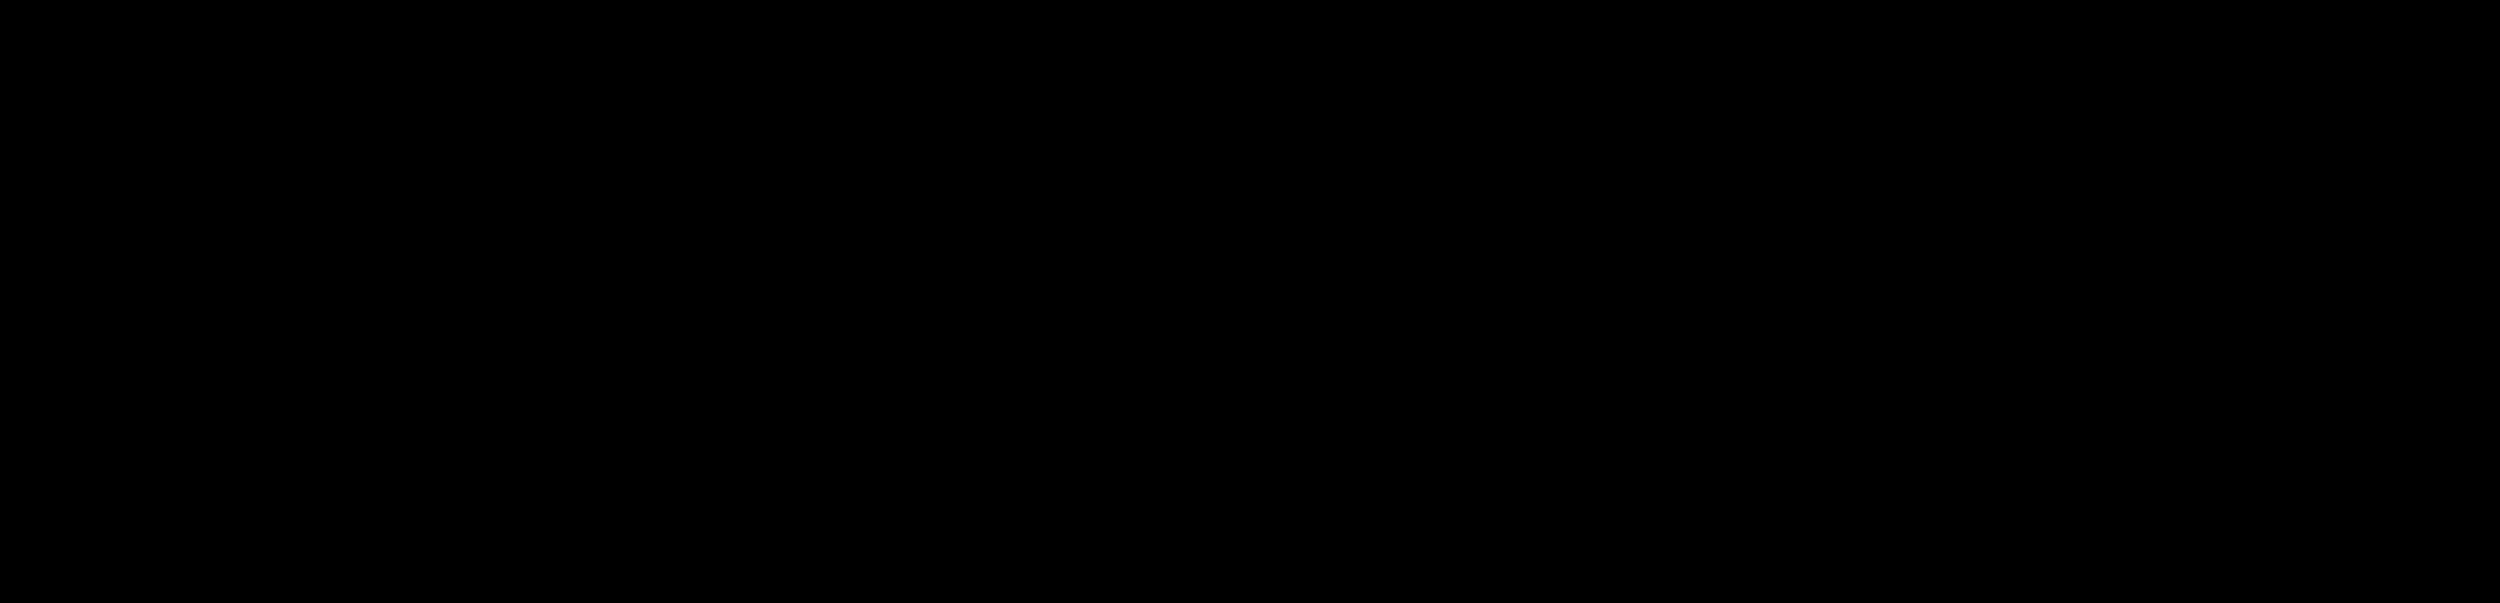 AG_Logo_black_and_white_hirez_bitmap.png